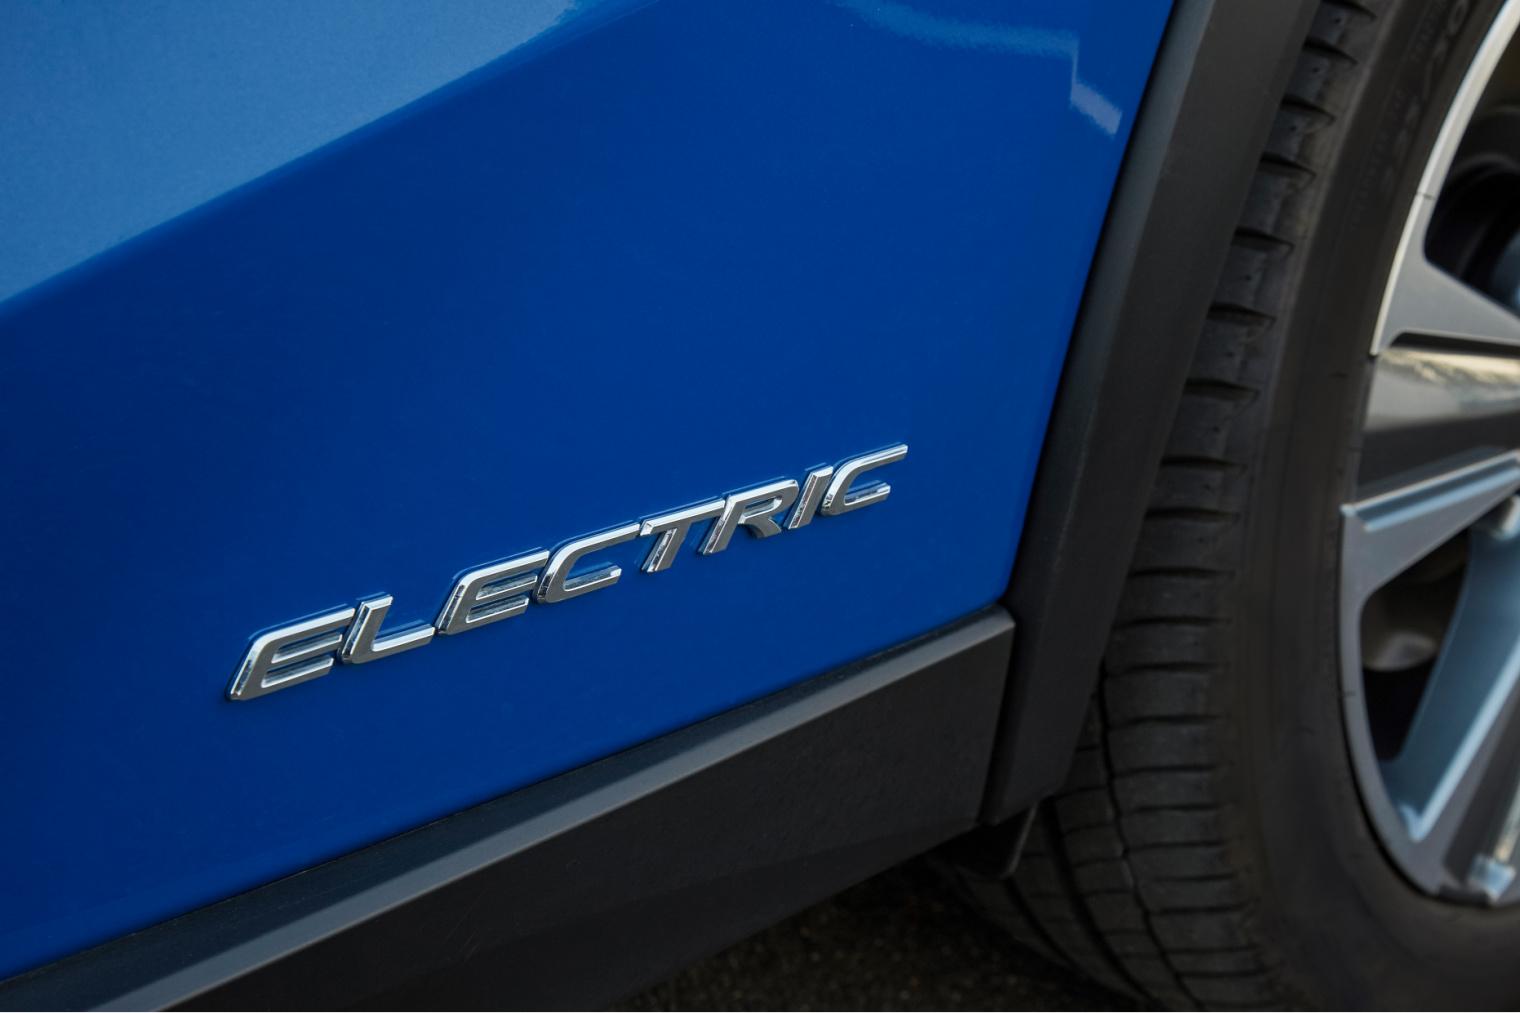 Autonomia nuova Lexus UX elettrica 2020